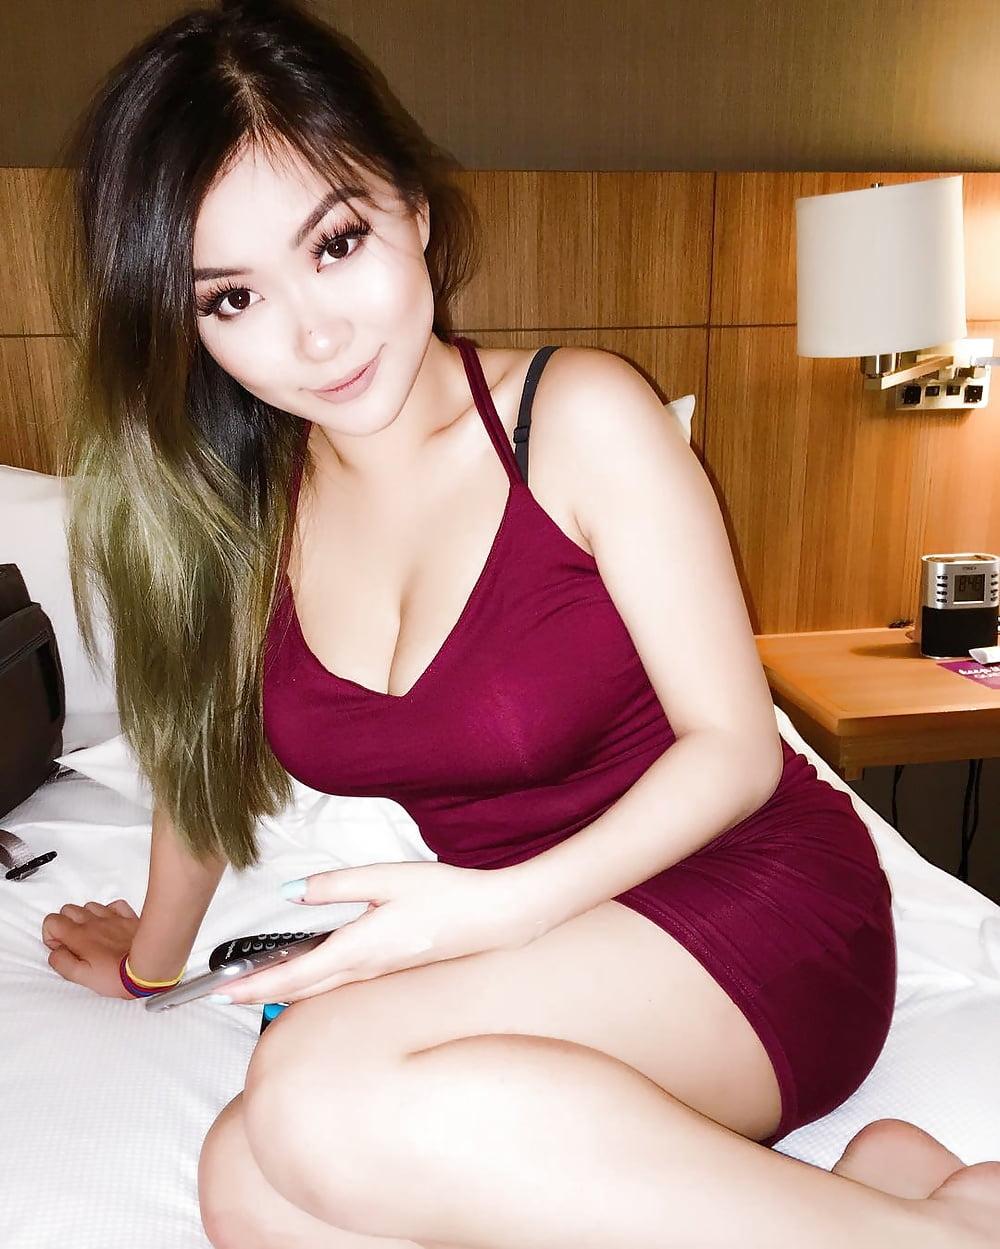 Busty Asian Model Vicki Li Photo 7 In Yandex Collections